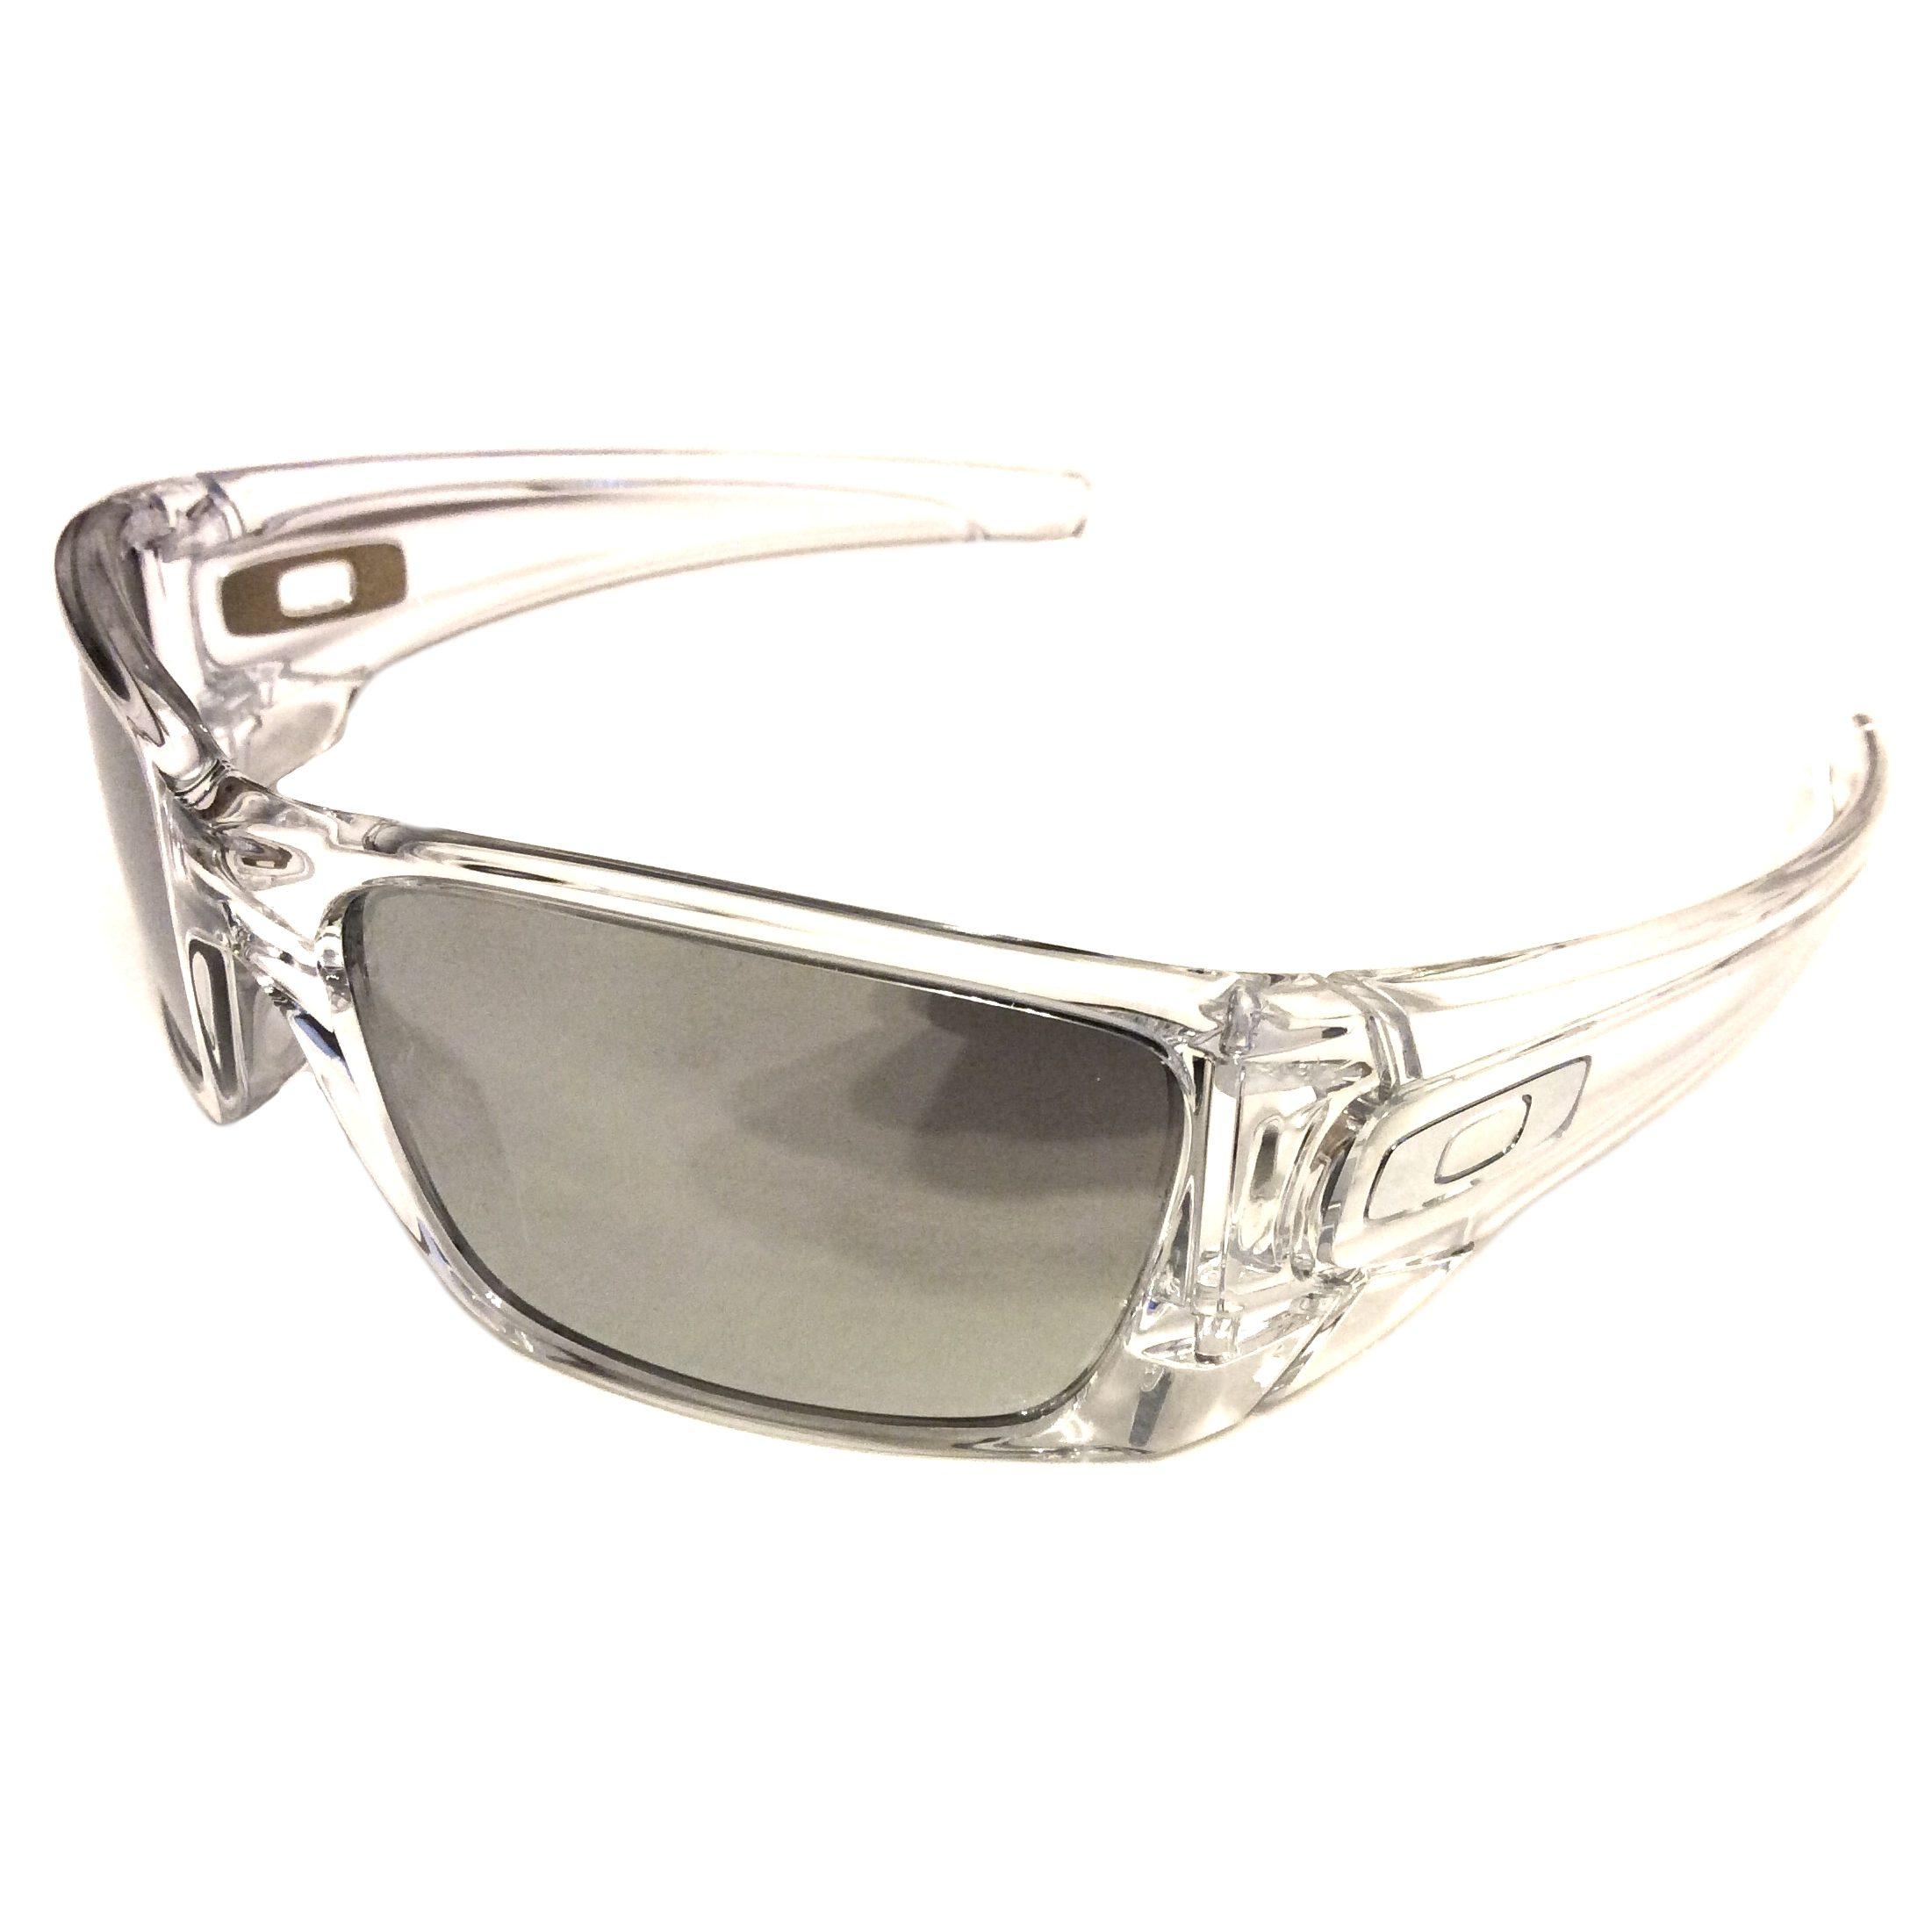 ef847a9991873 Oakley Fuel Cell – Polished Clear – Chrome Iridium OO9096-39 ...